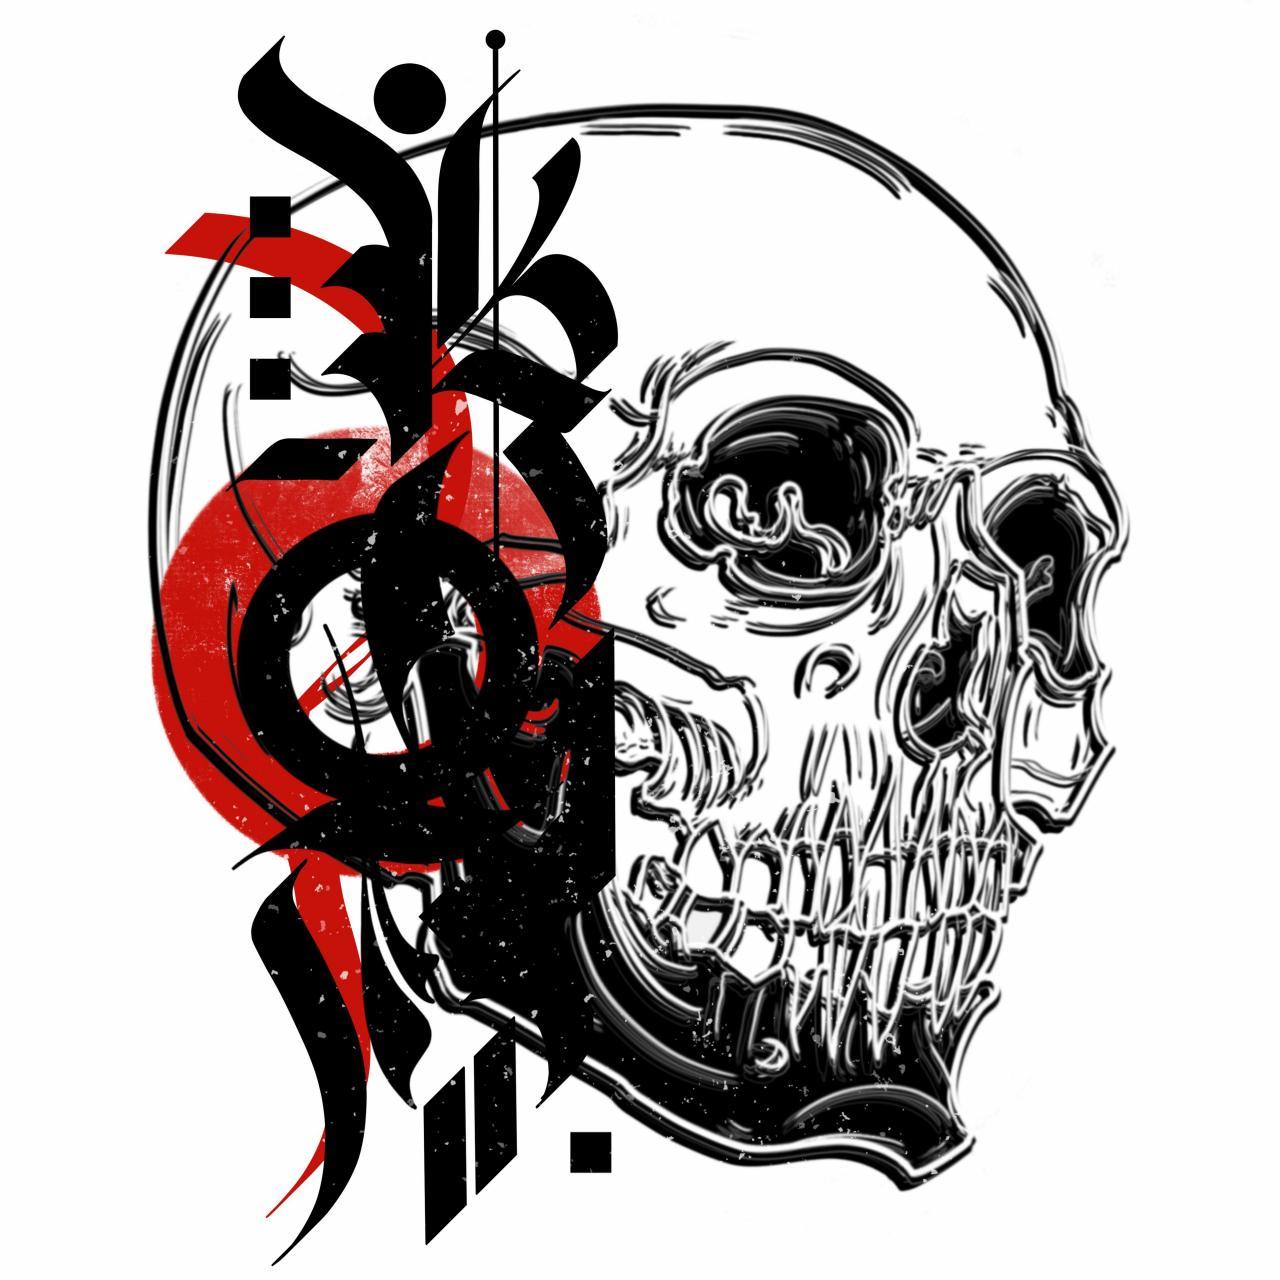 calligraffiti skull – I'm open for commissions – PM for cutom designs